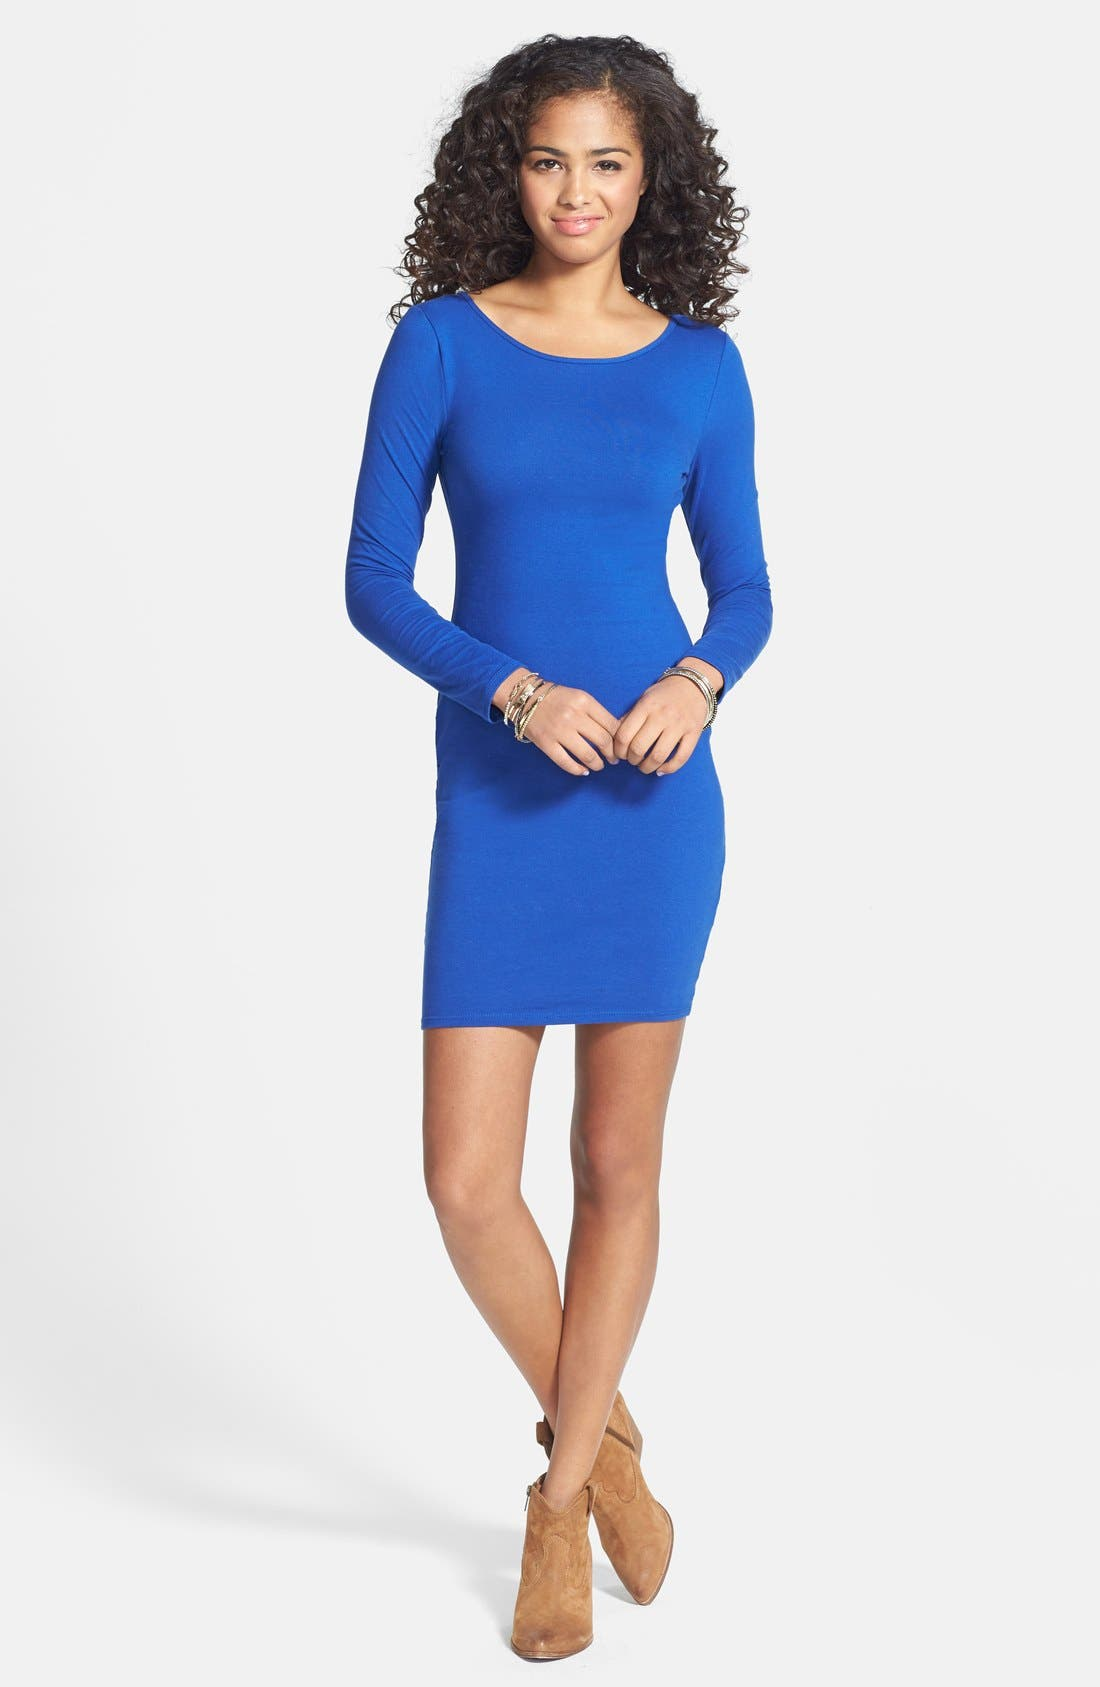 Alternate Image 1 Selected - Socialite Long Sleeve Body-Con Dress (Juniors)